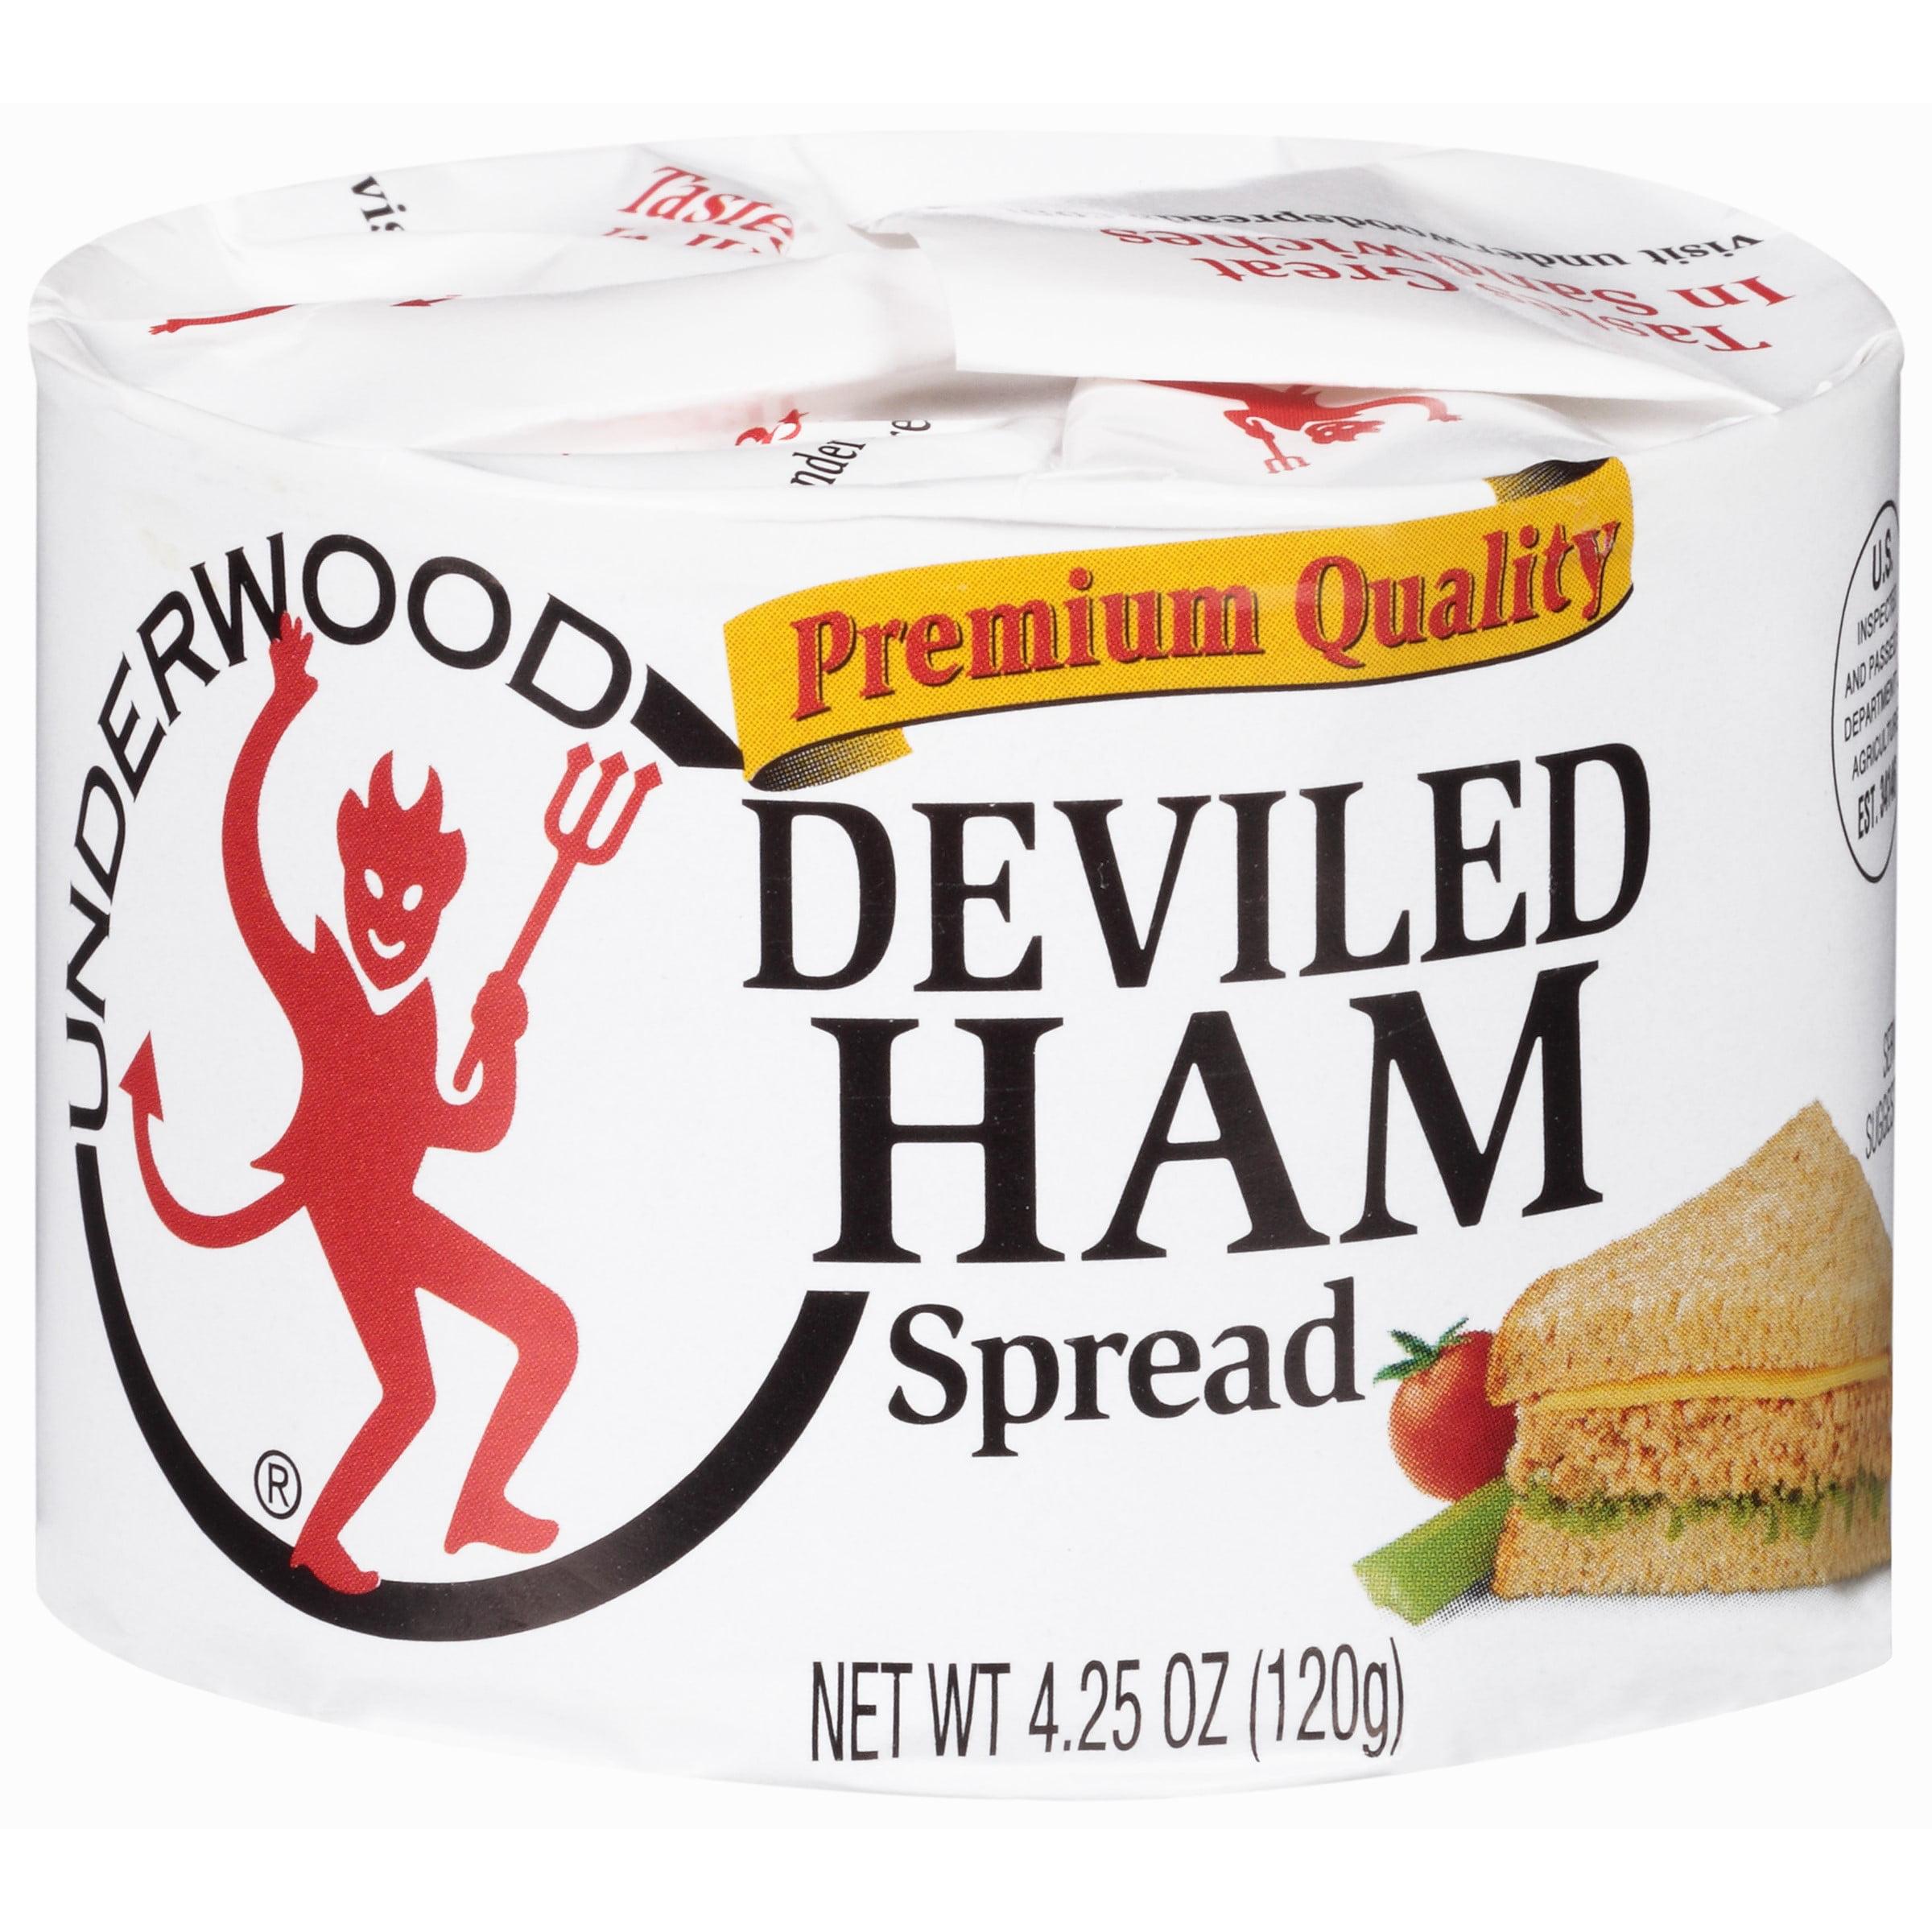 Underwood Premium Quality Deviled Ham Spread, 4.25 OZ